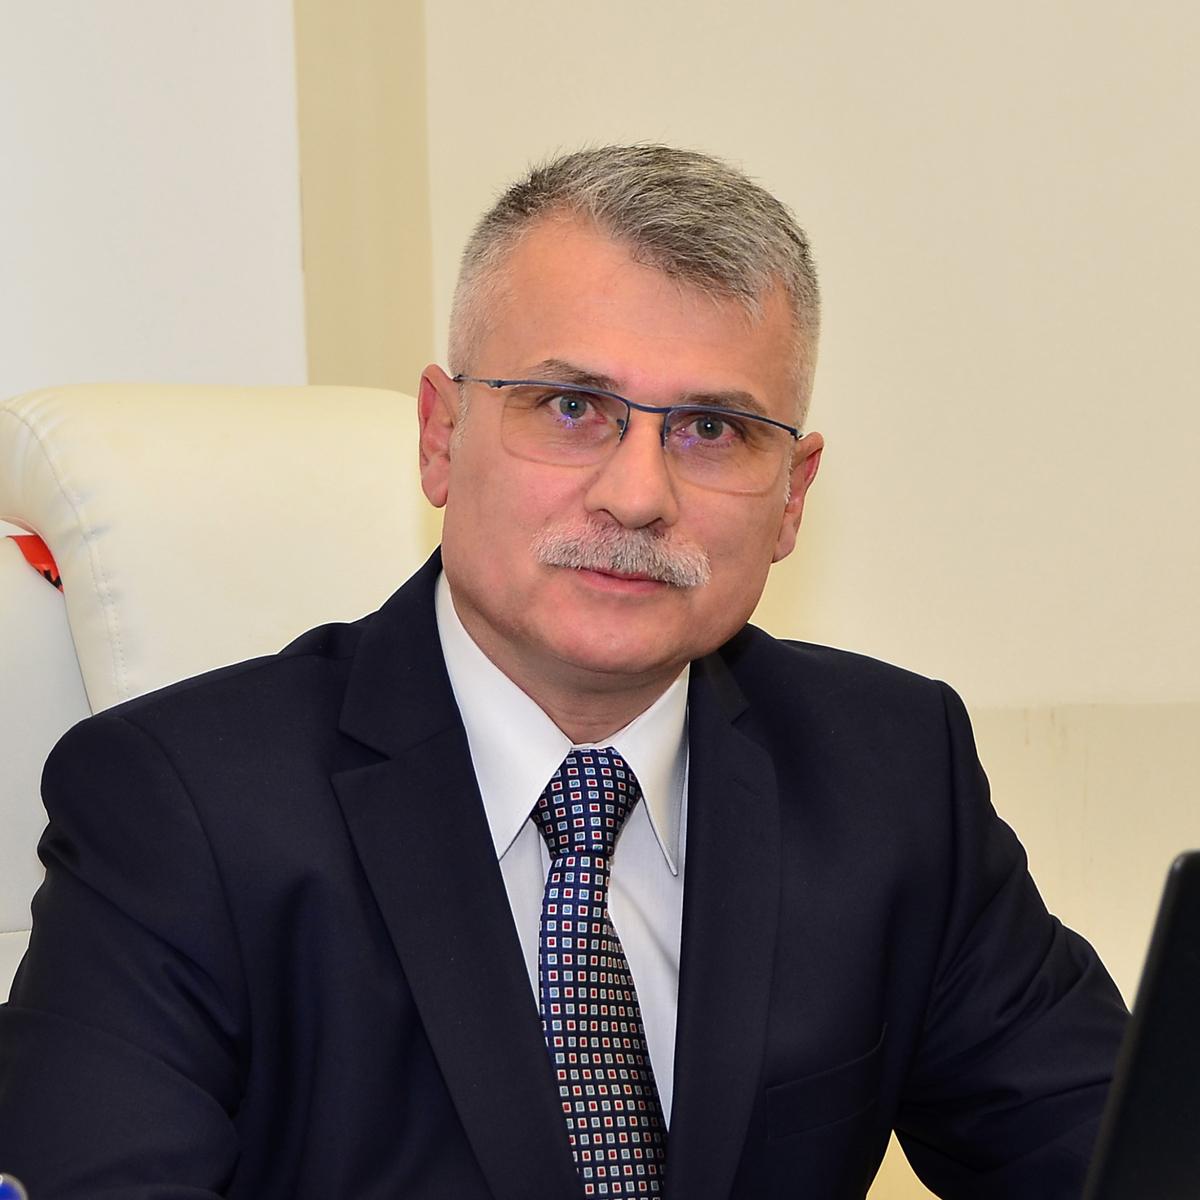 Assist. Prof. Vicentiu Saceleanu, MD, PhD